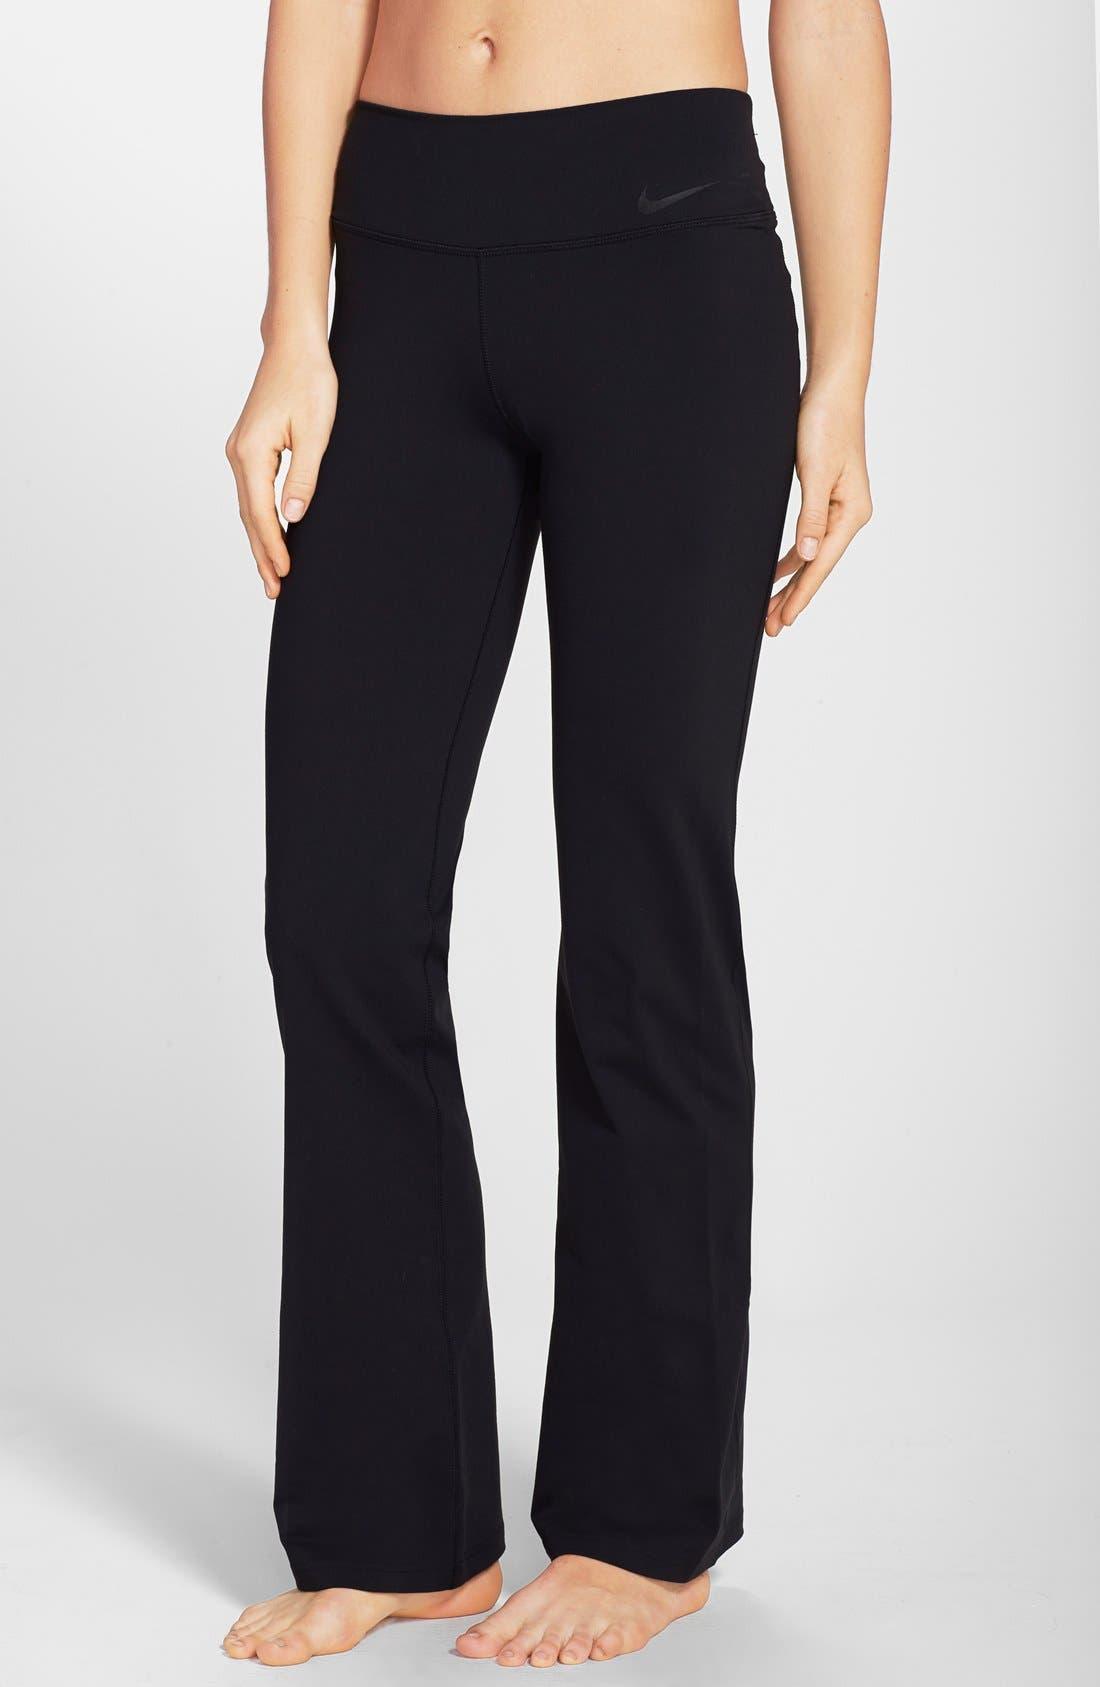 Main Image - Nike 'Legendary Regular' Dri-FIT Pants